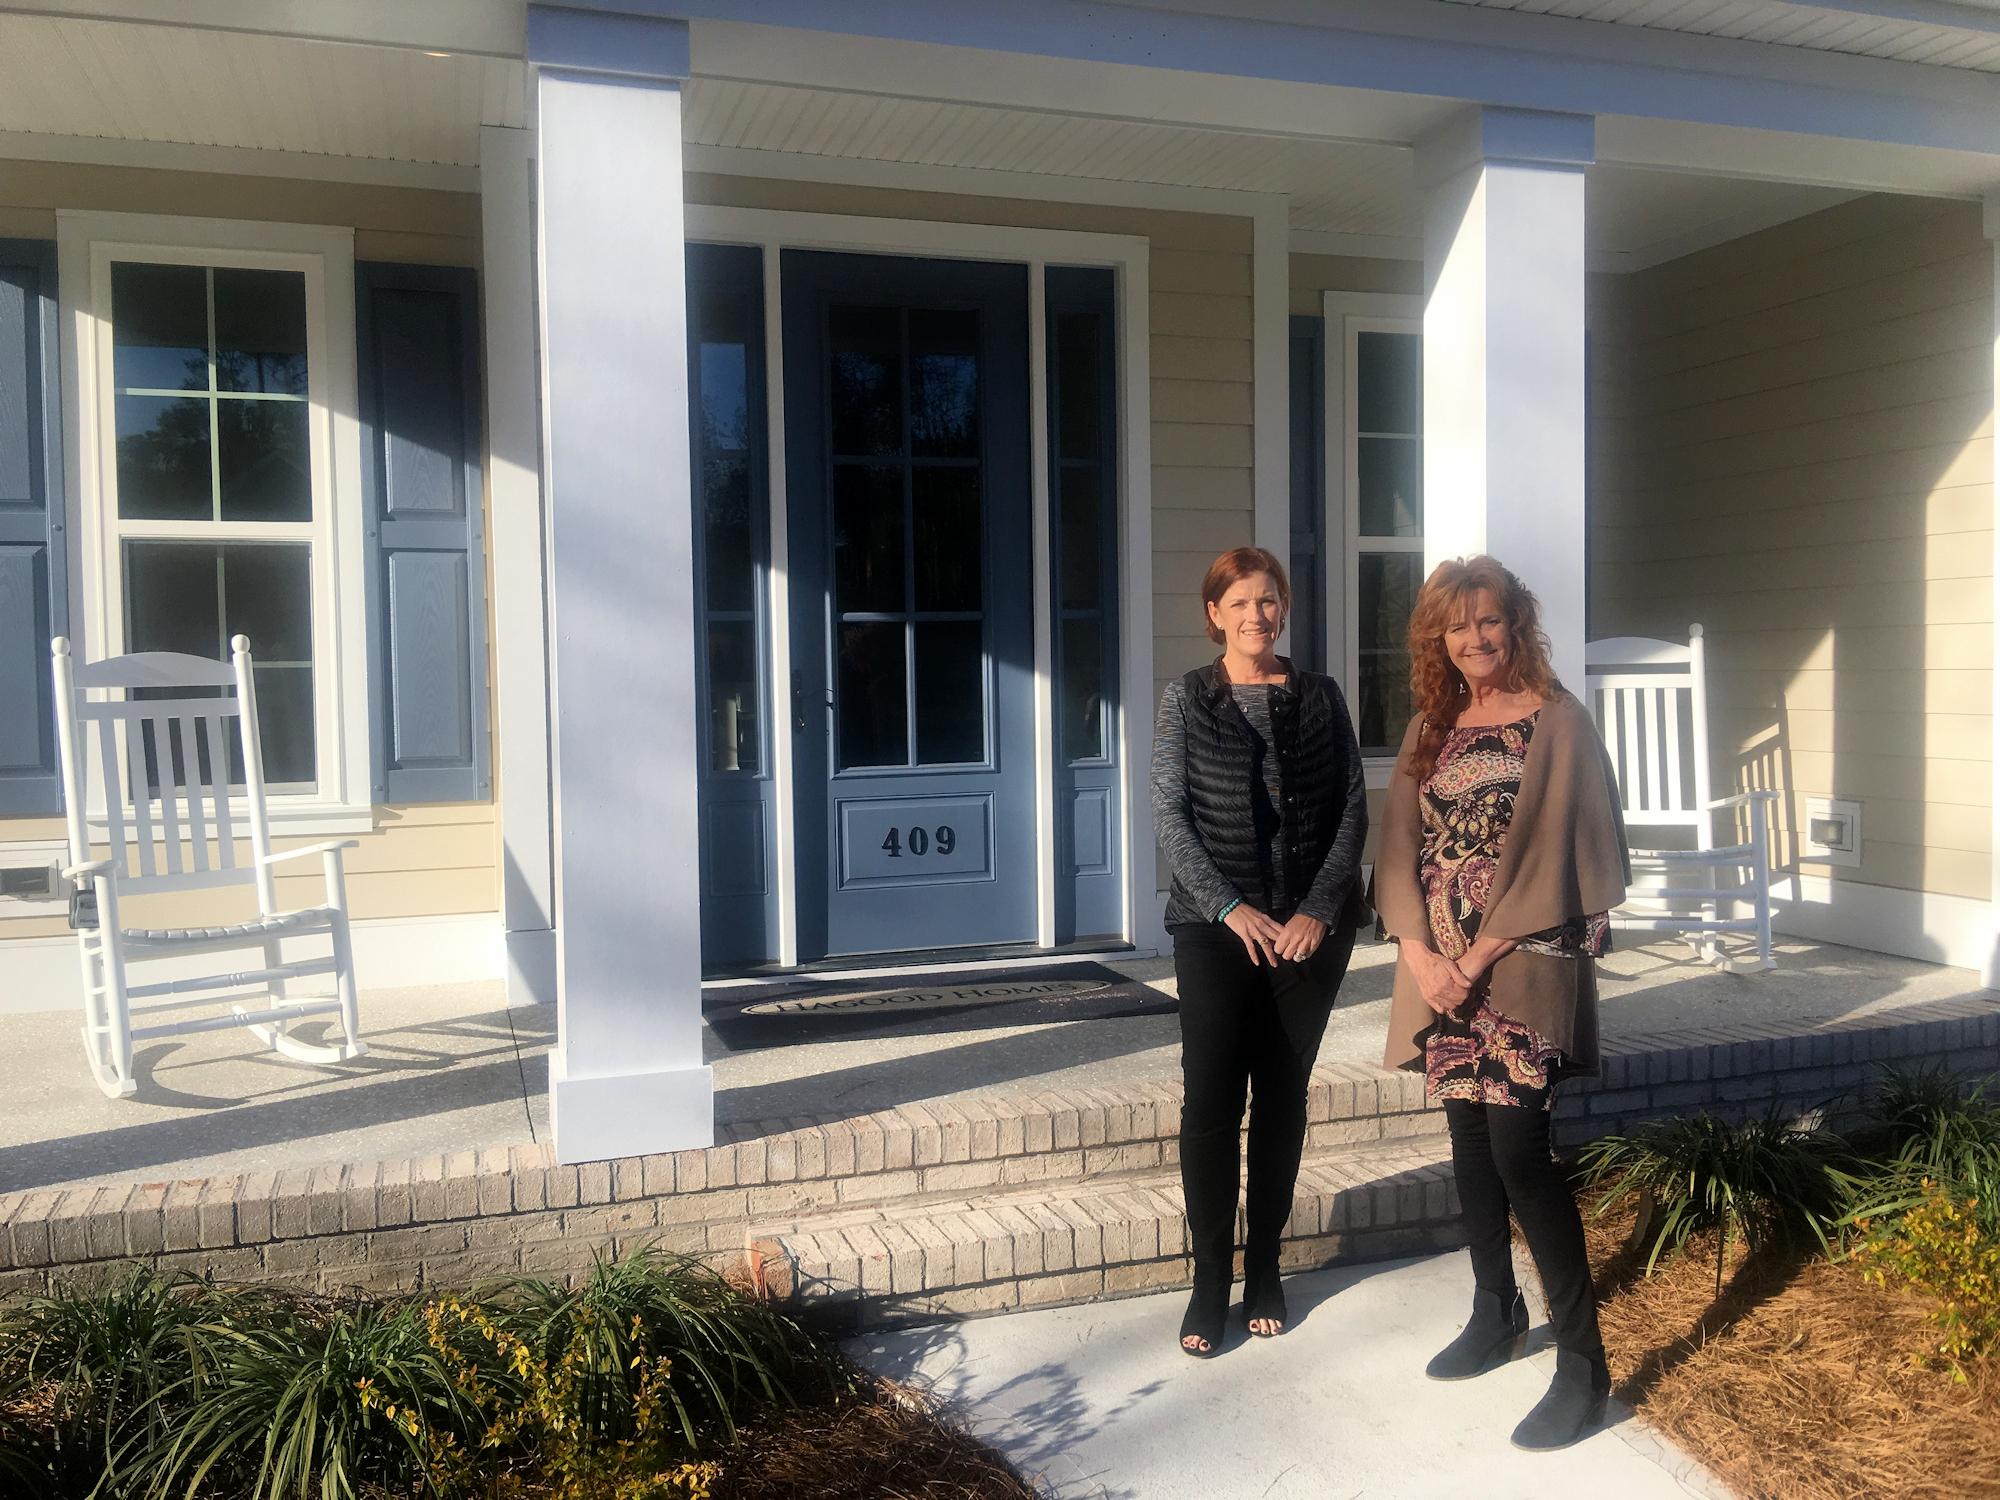 Melanie Cameron and Nora Ruehle - Catherines Cove